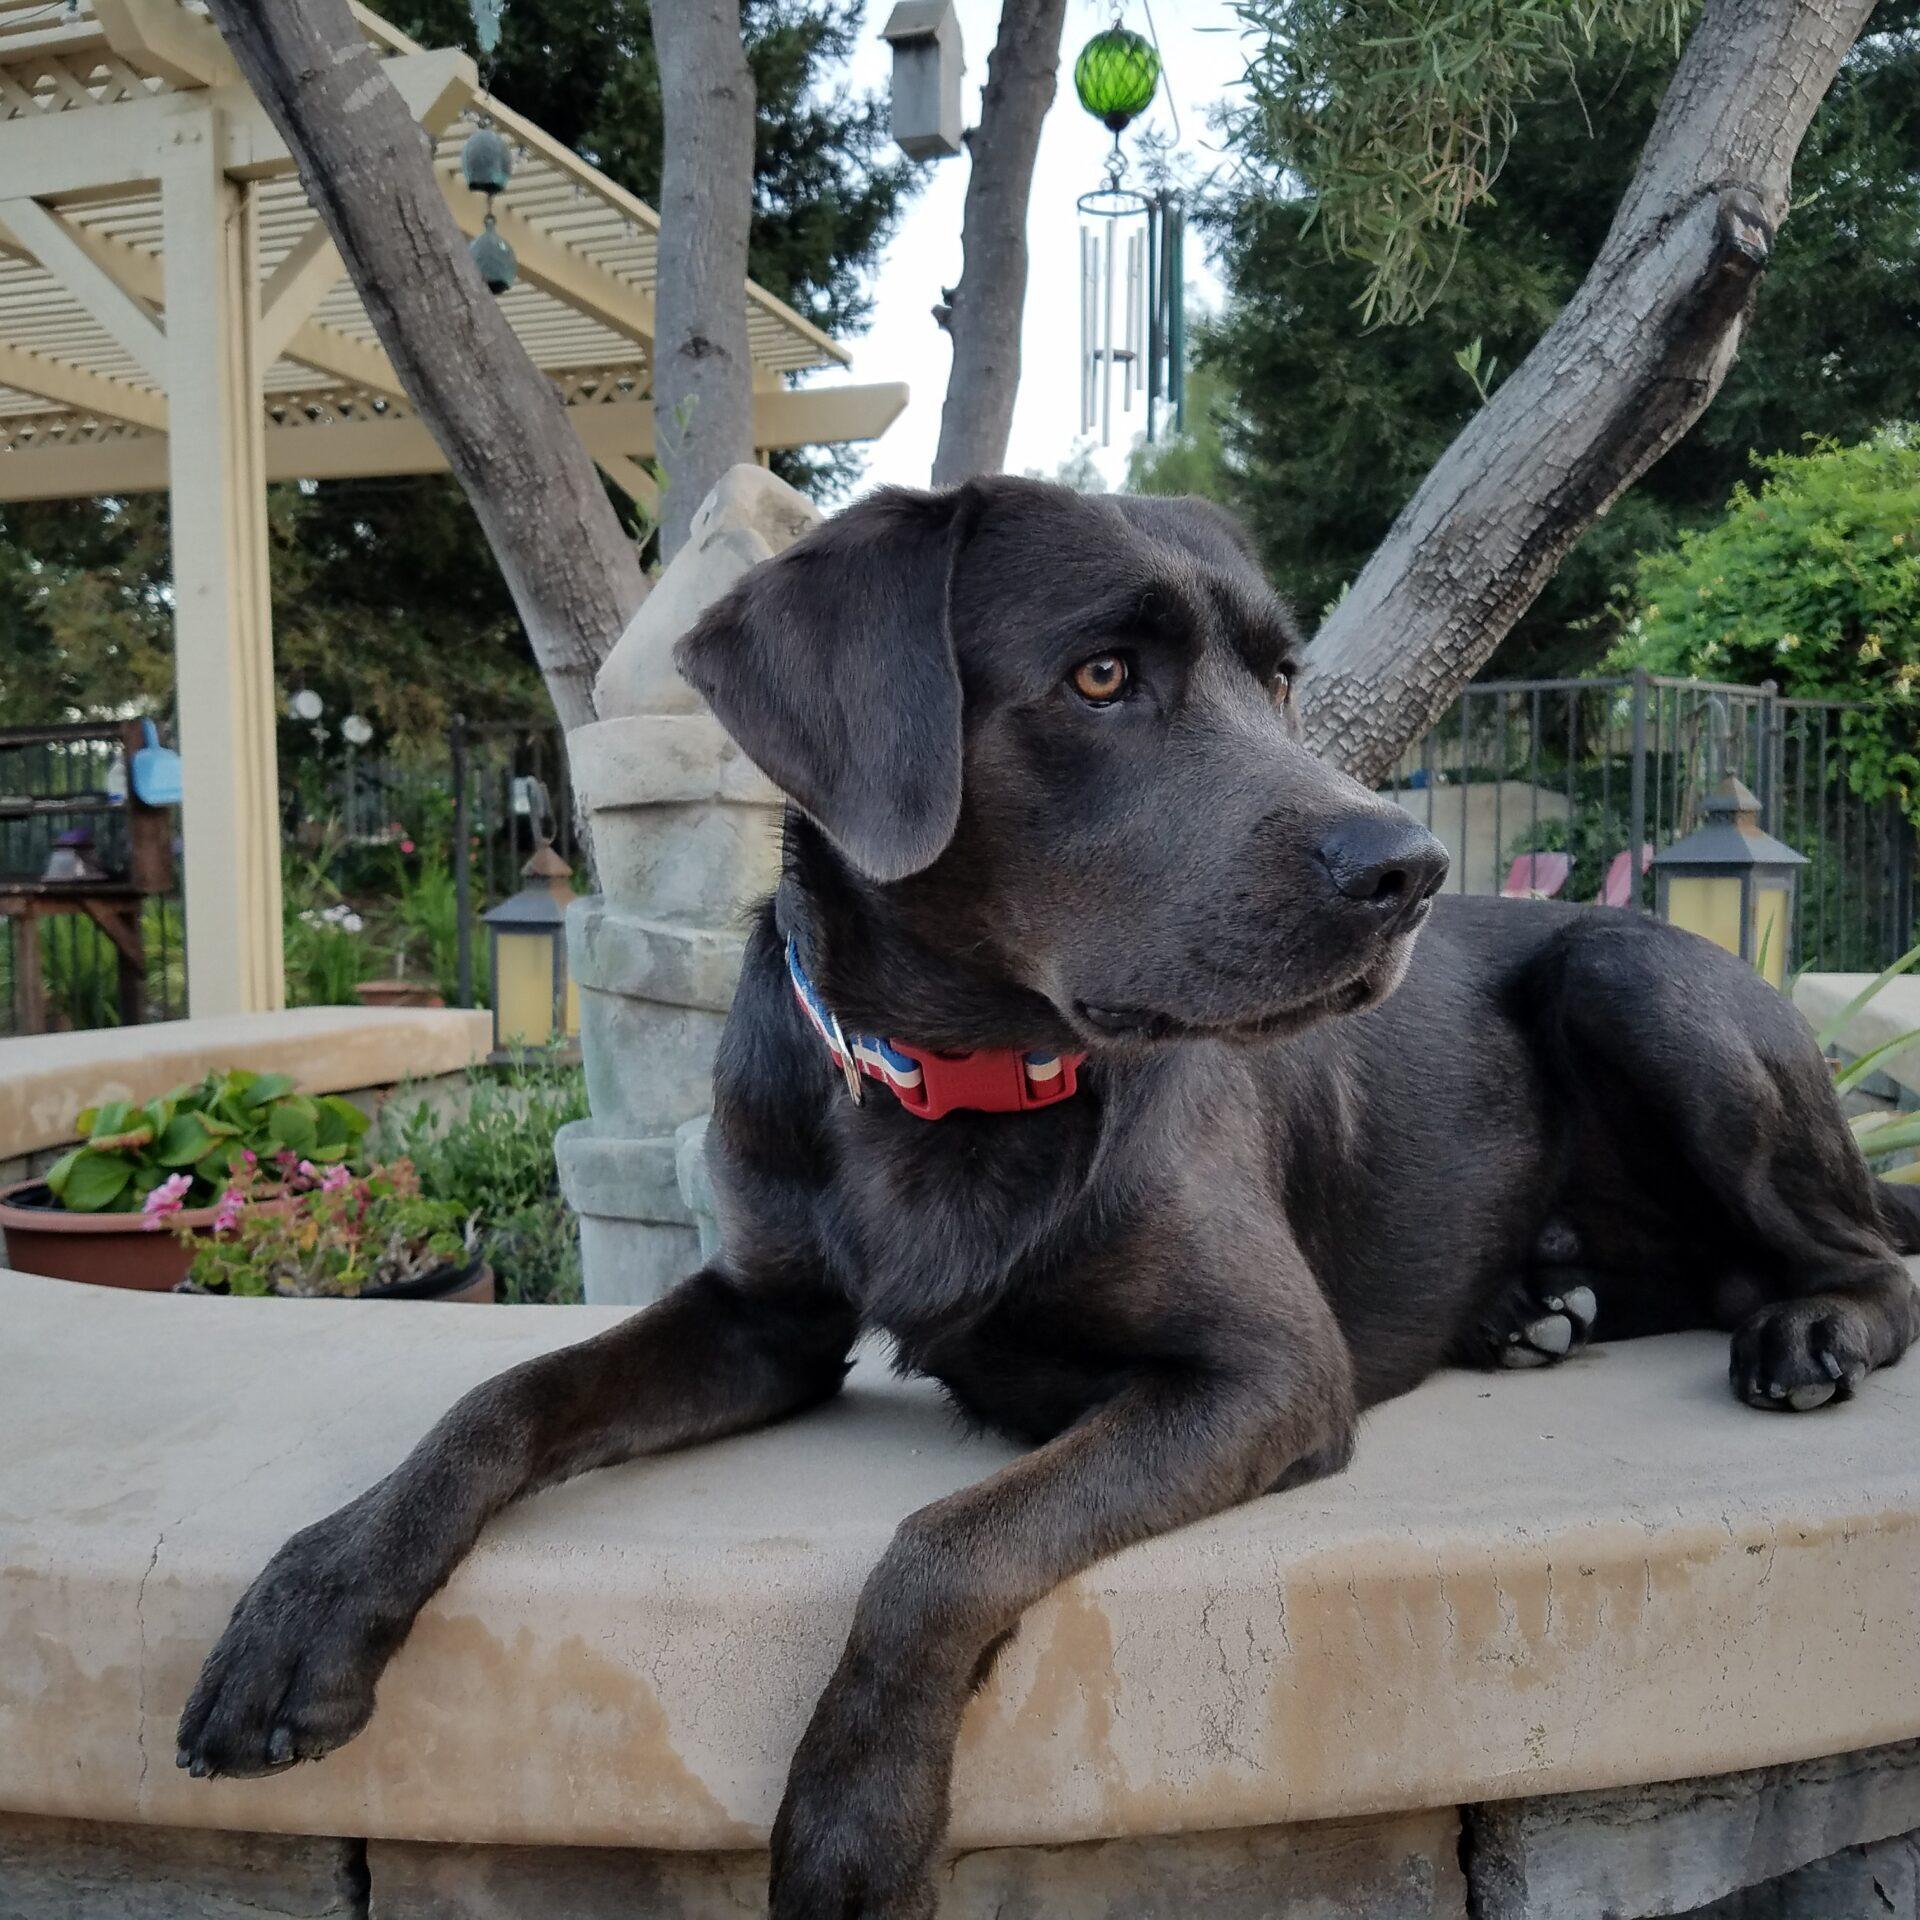 A black dog sitting on a planter.